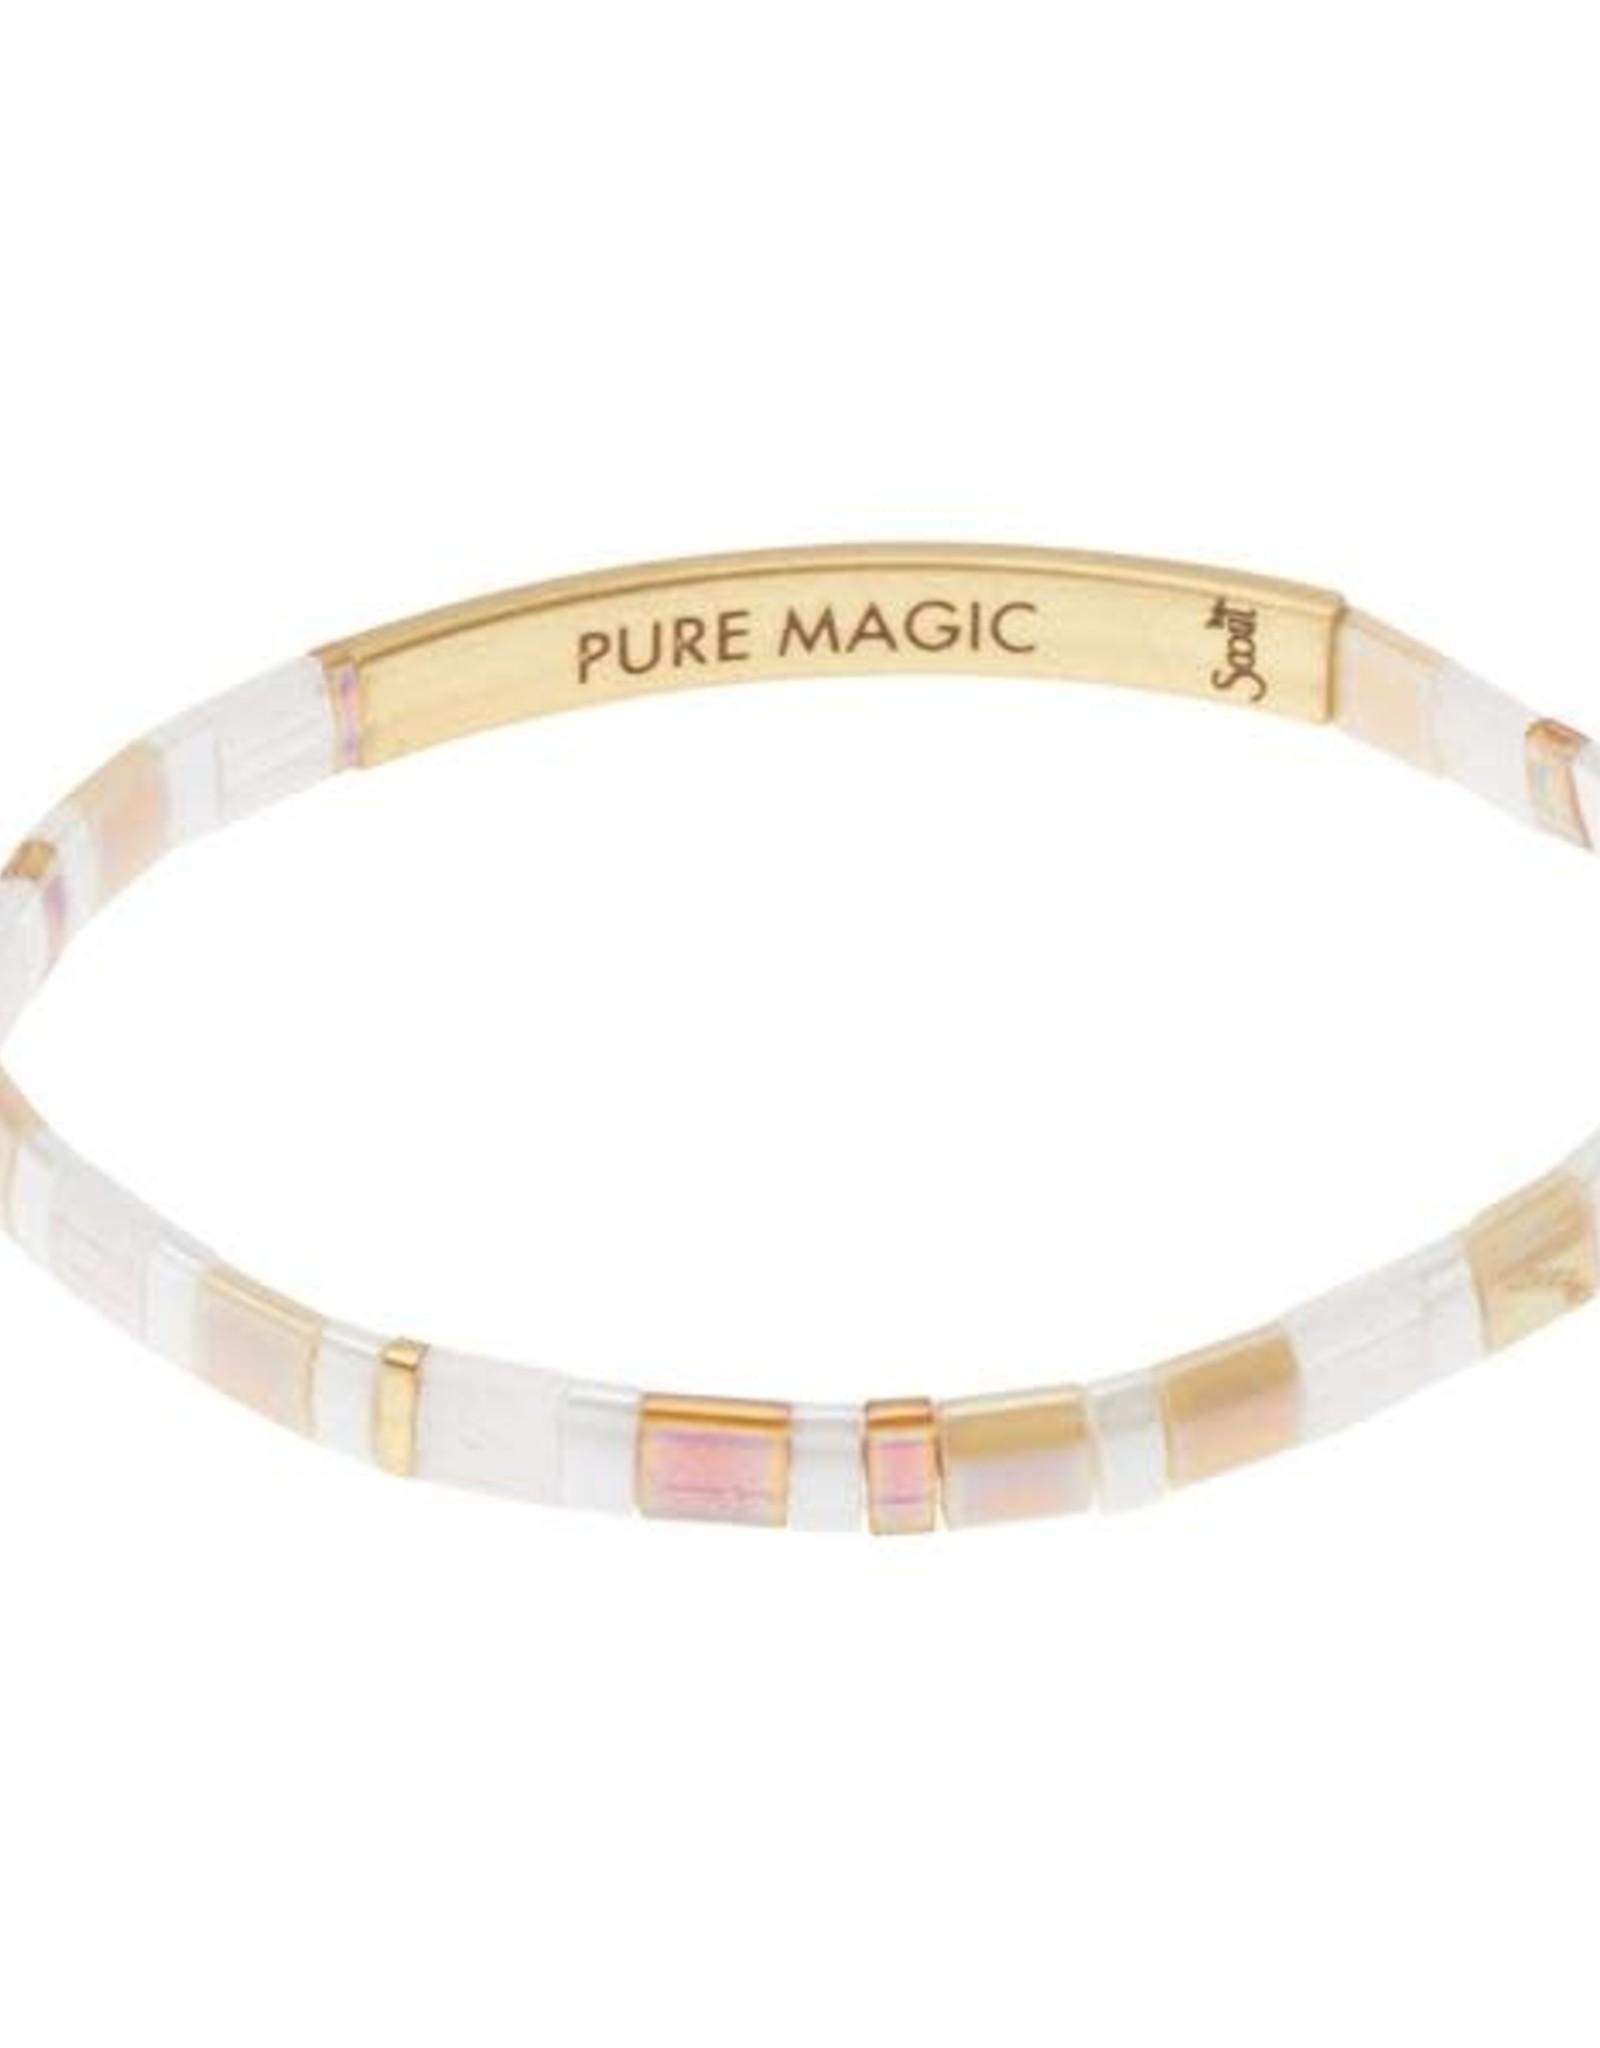 Scout Scout Good Karma Miyuki Bracelet - Pure Magic Netural/Gold